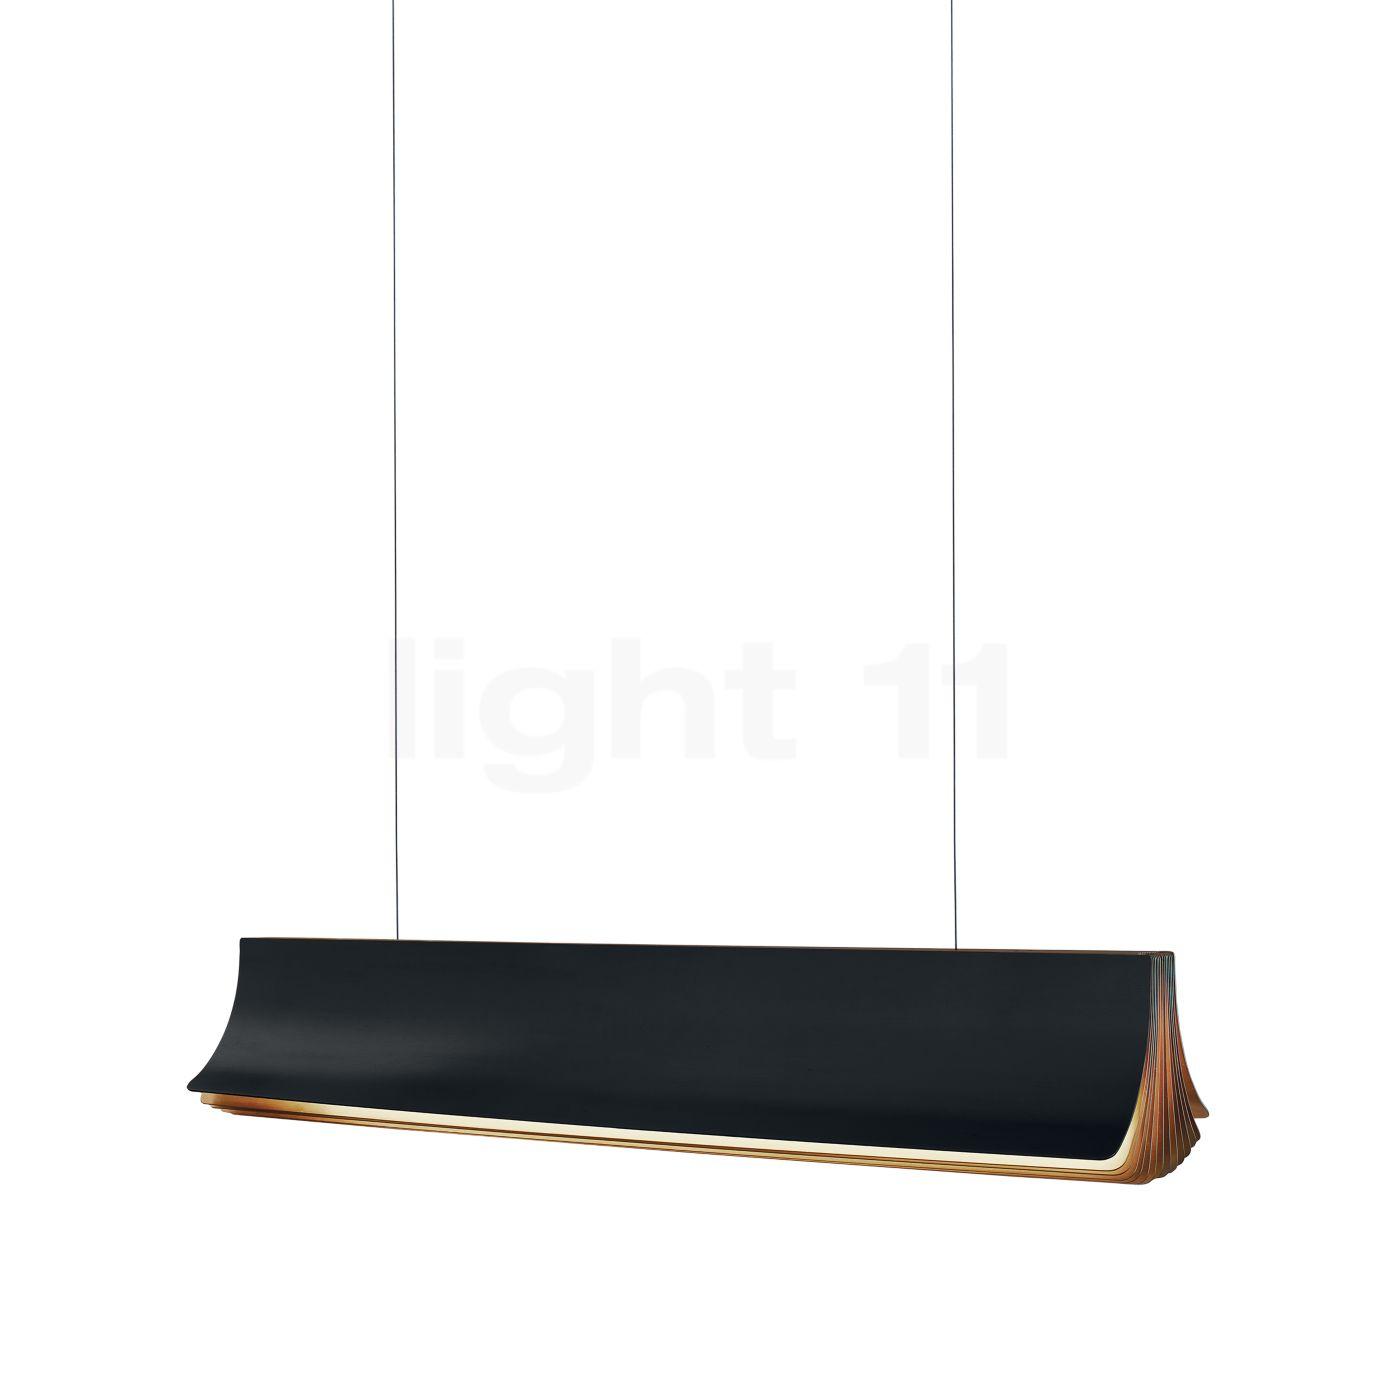 DCW Respiro Pendelleuchte LED, schwarz, 90 cm RESPIRO 900 BL-GOLD